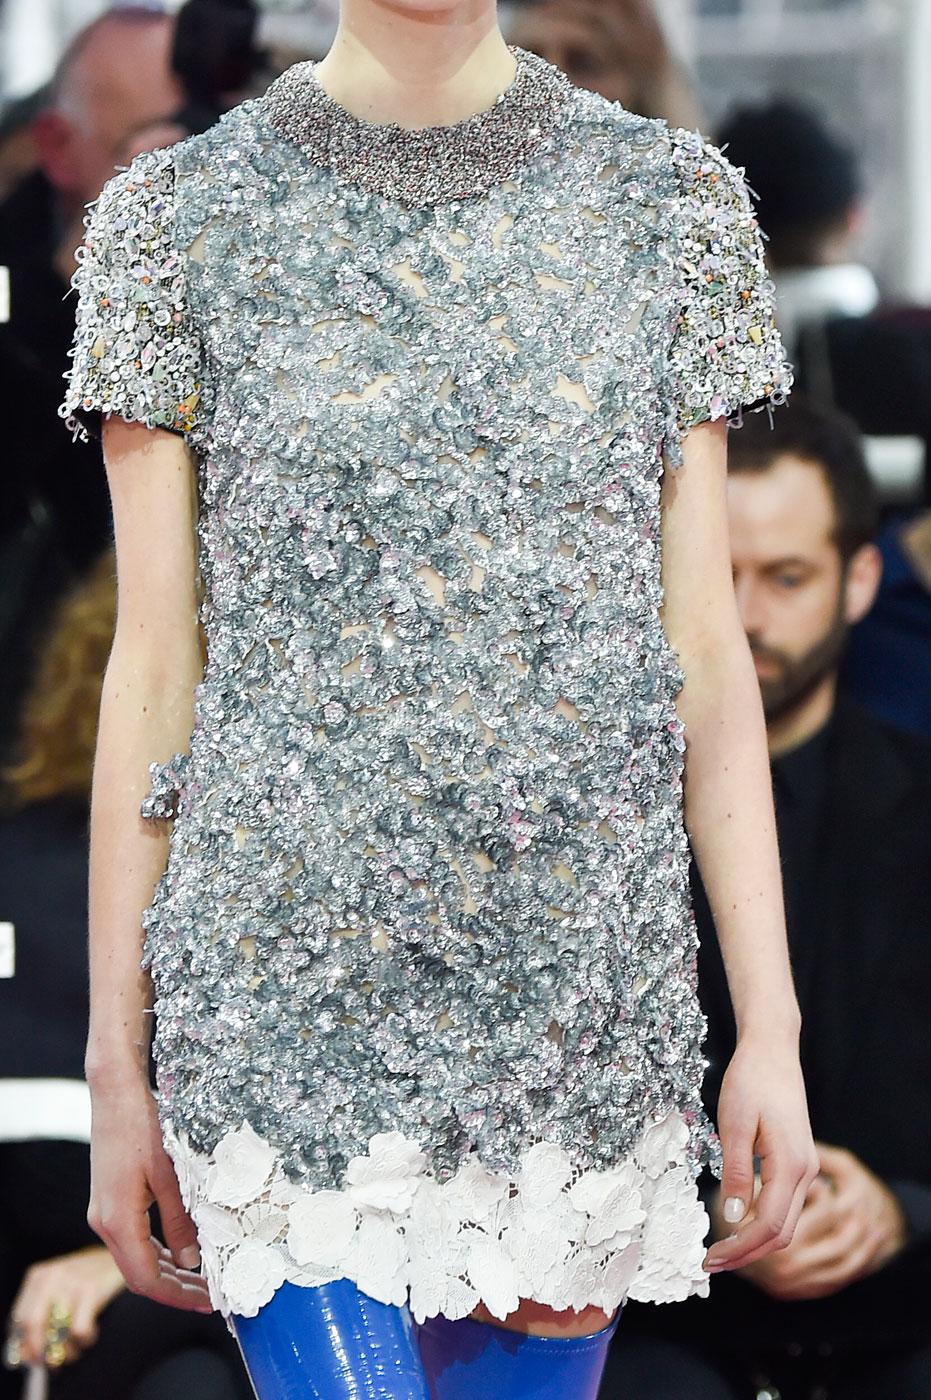 Christian-Dior-fashion-runway-show-close-ups-haute-couture-paris-spring-summer-2015-the-impression-096